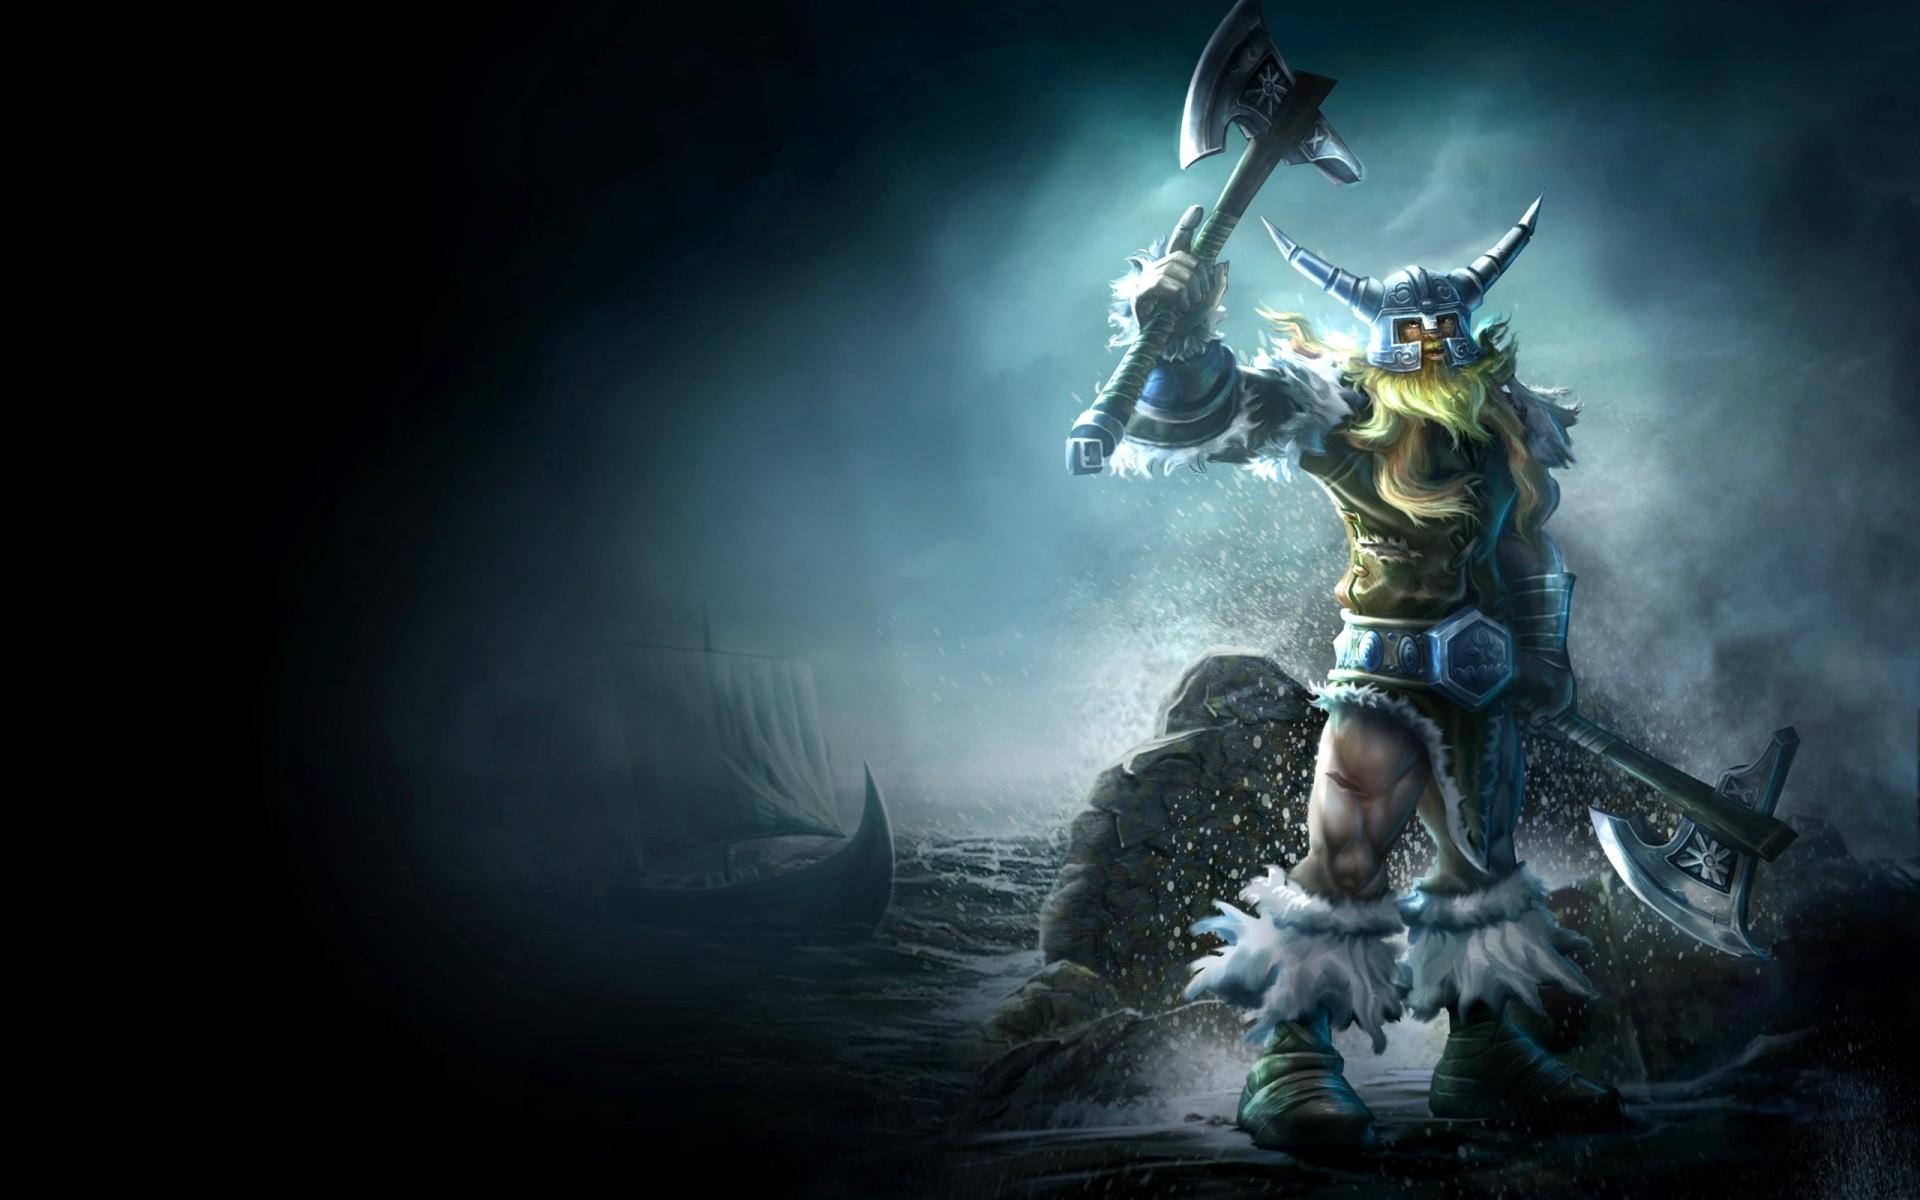 League of Legends fantasy art warriors weapons axe vikings ships boats  wallpaper background